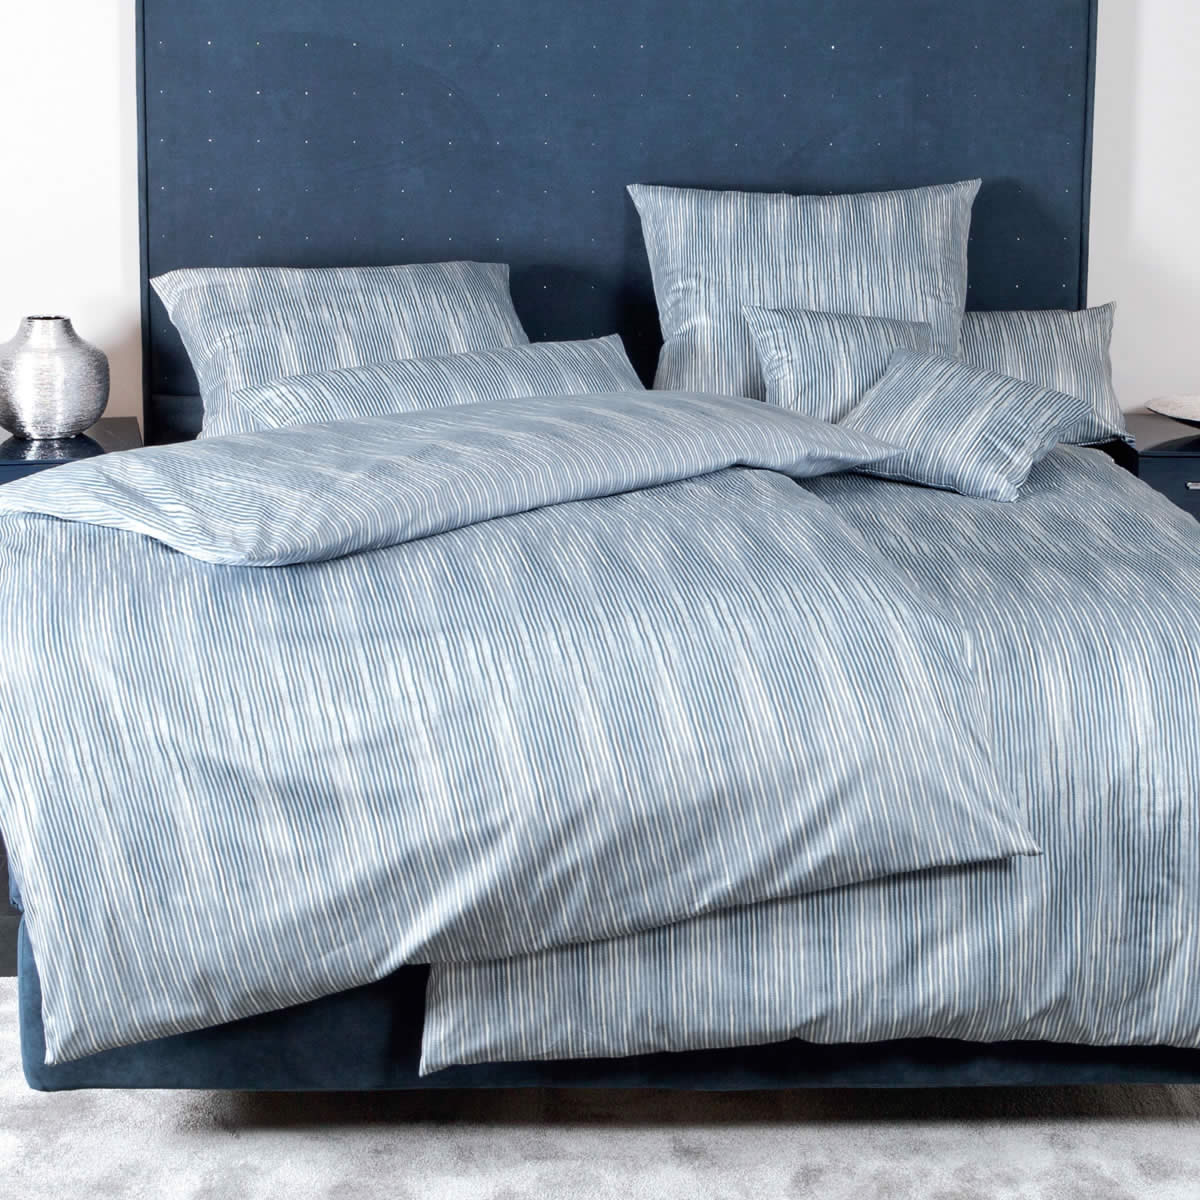 janine interlock fein jersey bettw sche carmen 53031 02 perlblau. Black Bedroom Furniture Sets. Home Design Ideas